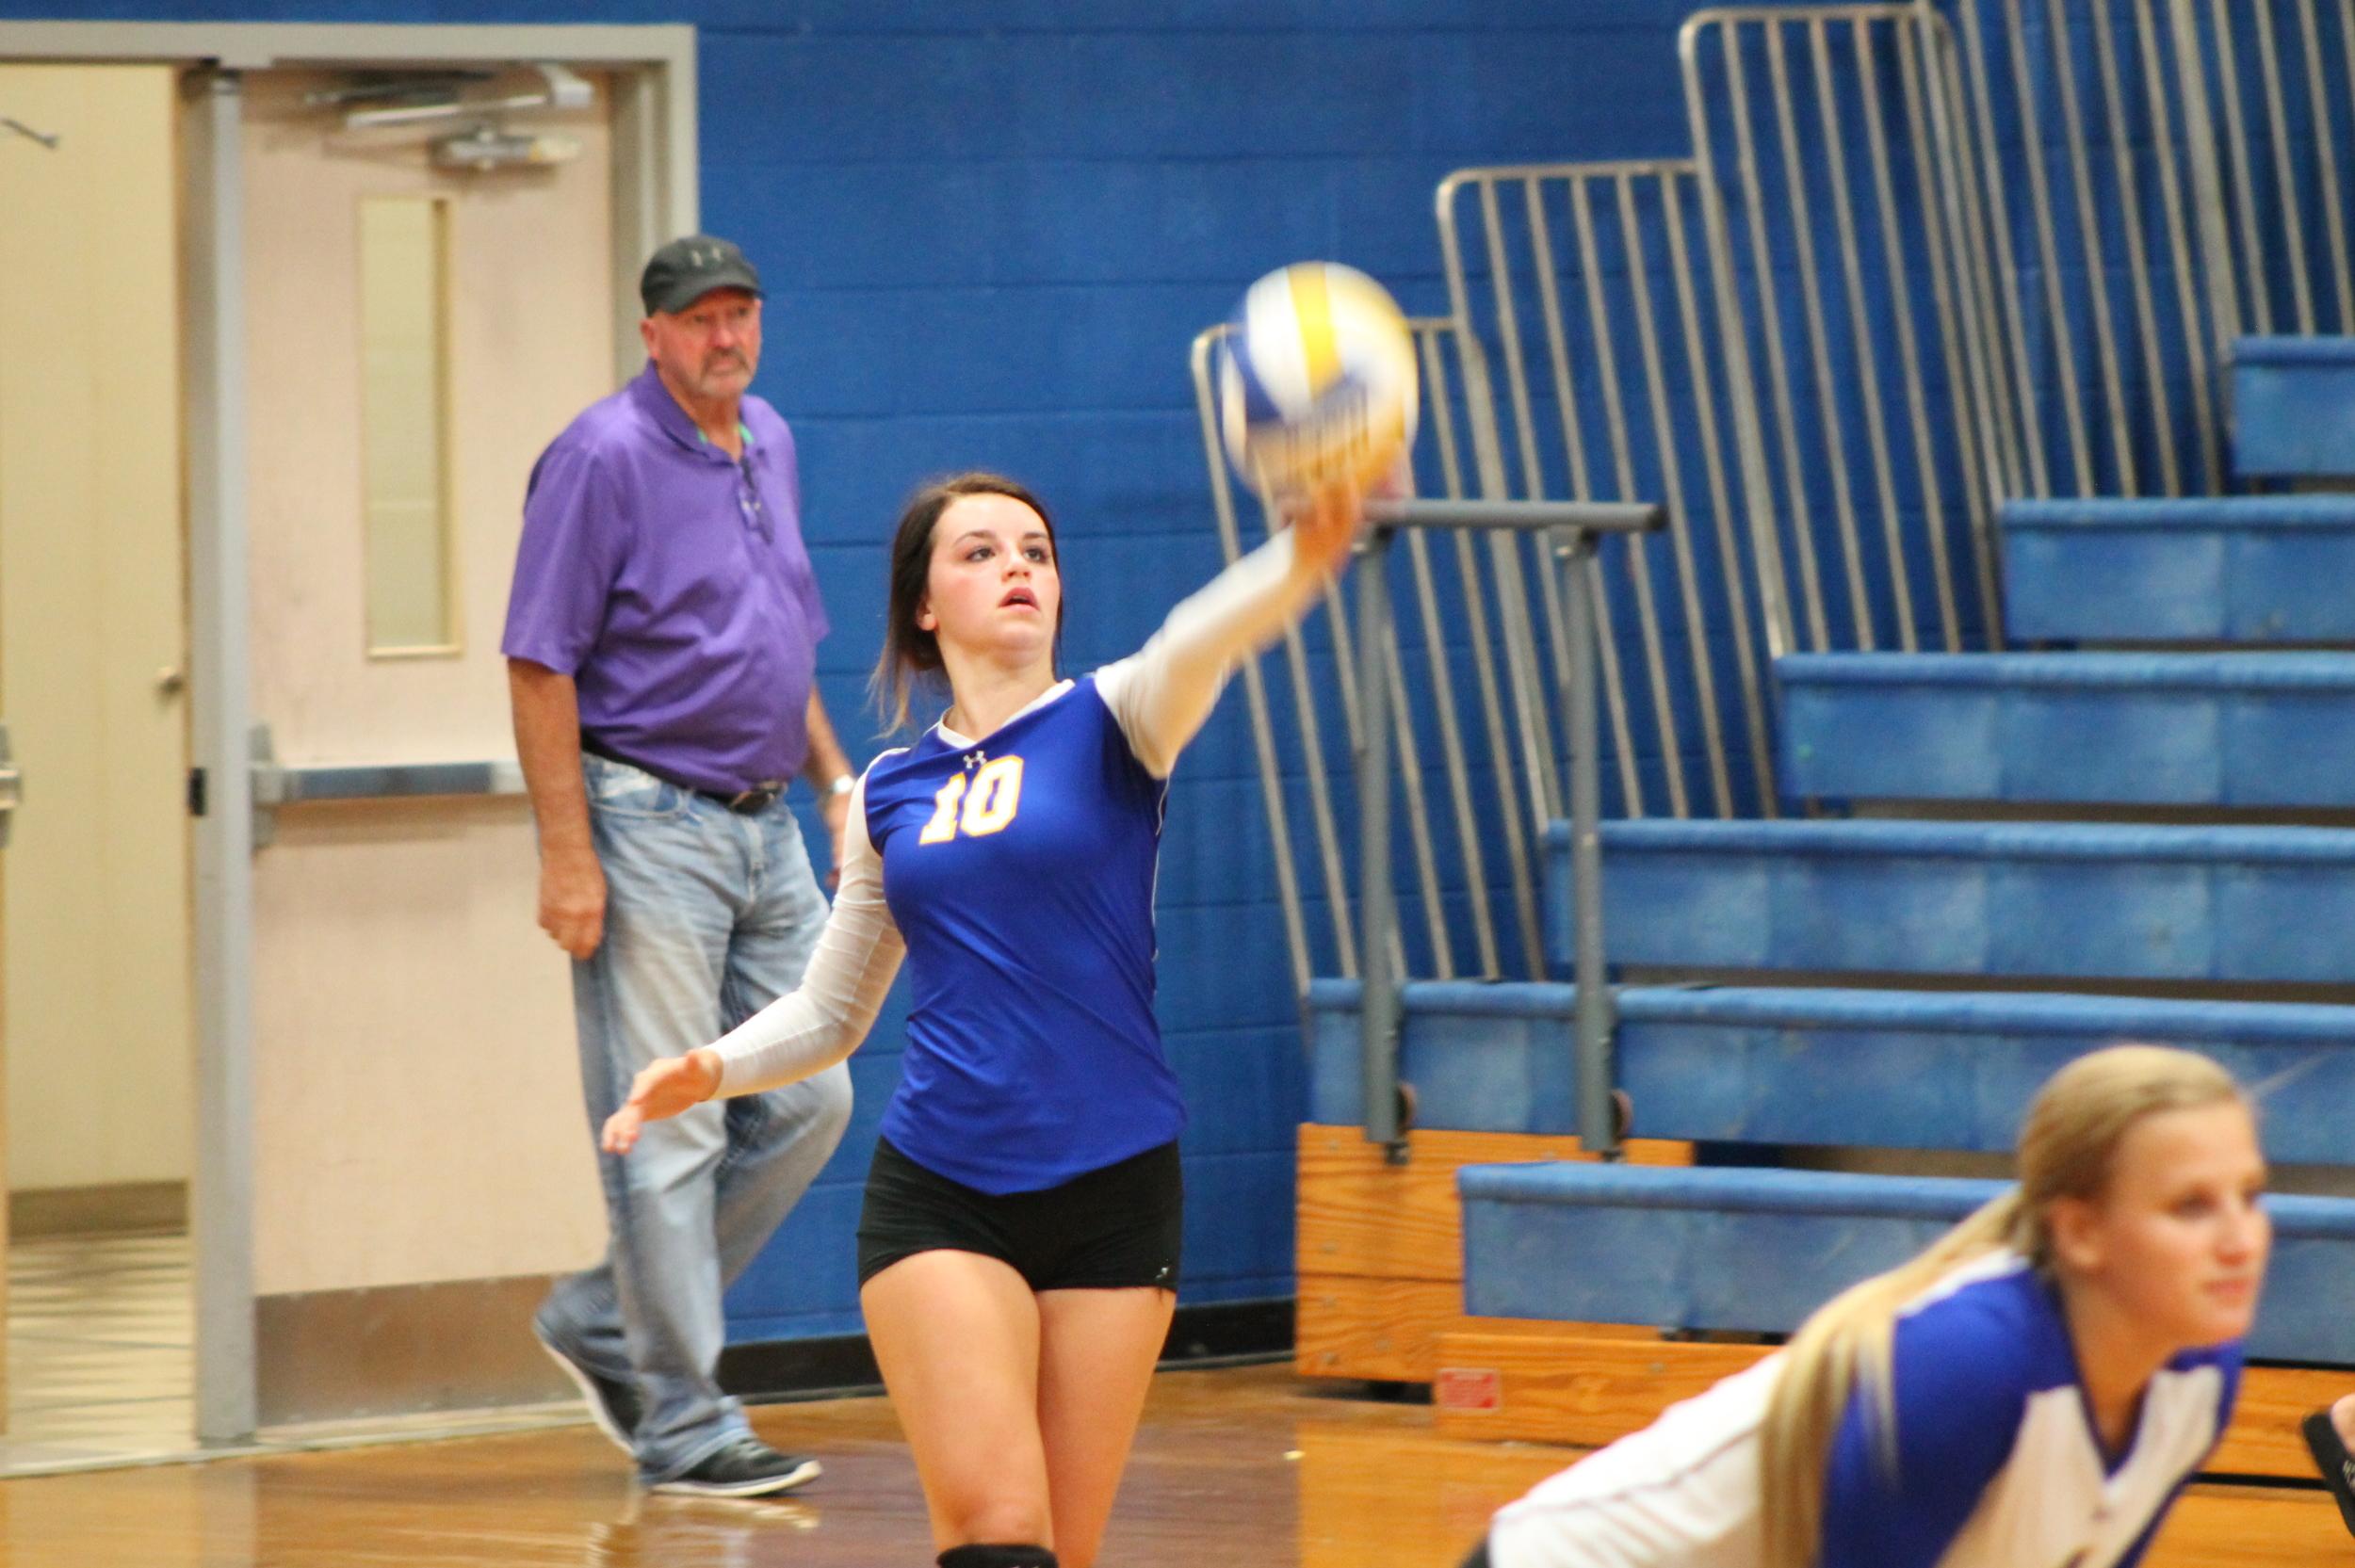 Mara Mabry serving the ball against Melissa